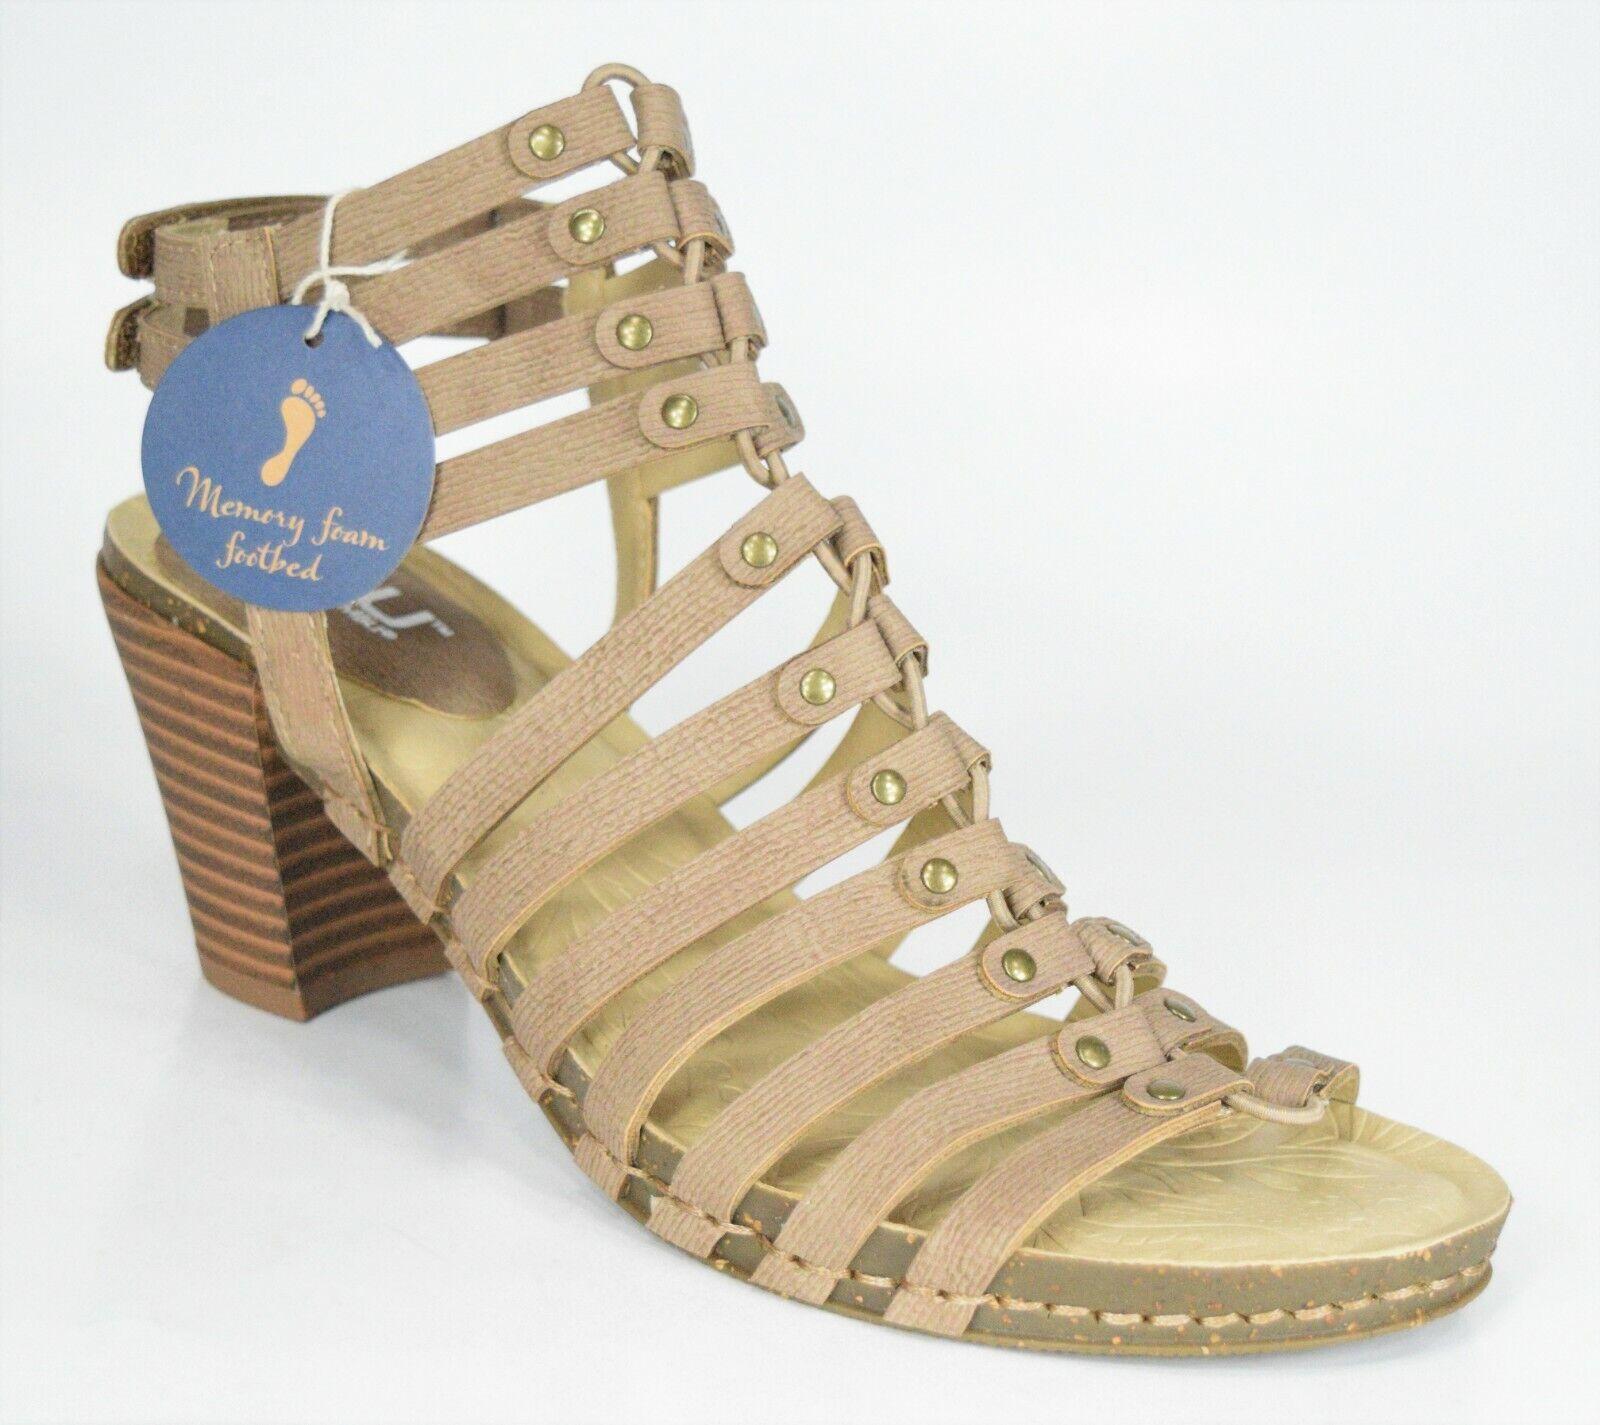 JBU Jambu Sugar Encore Nude Vegan Ankle Strap Gladiator Heels Size 7.5 (M) NEW